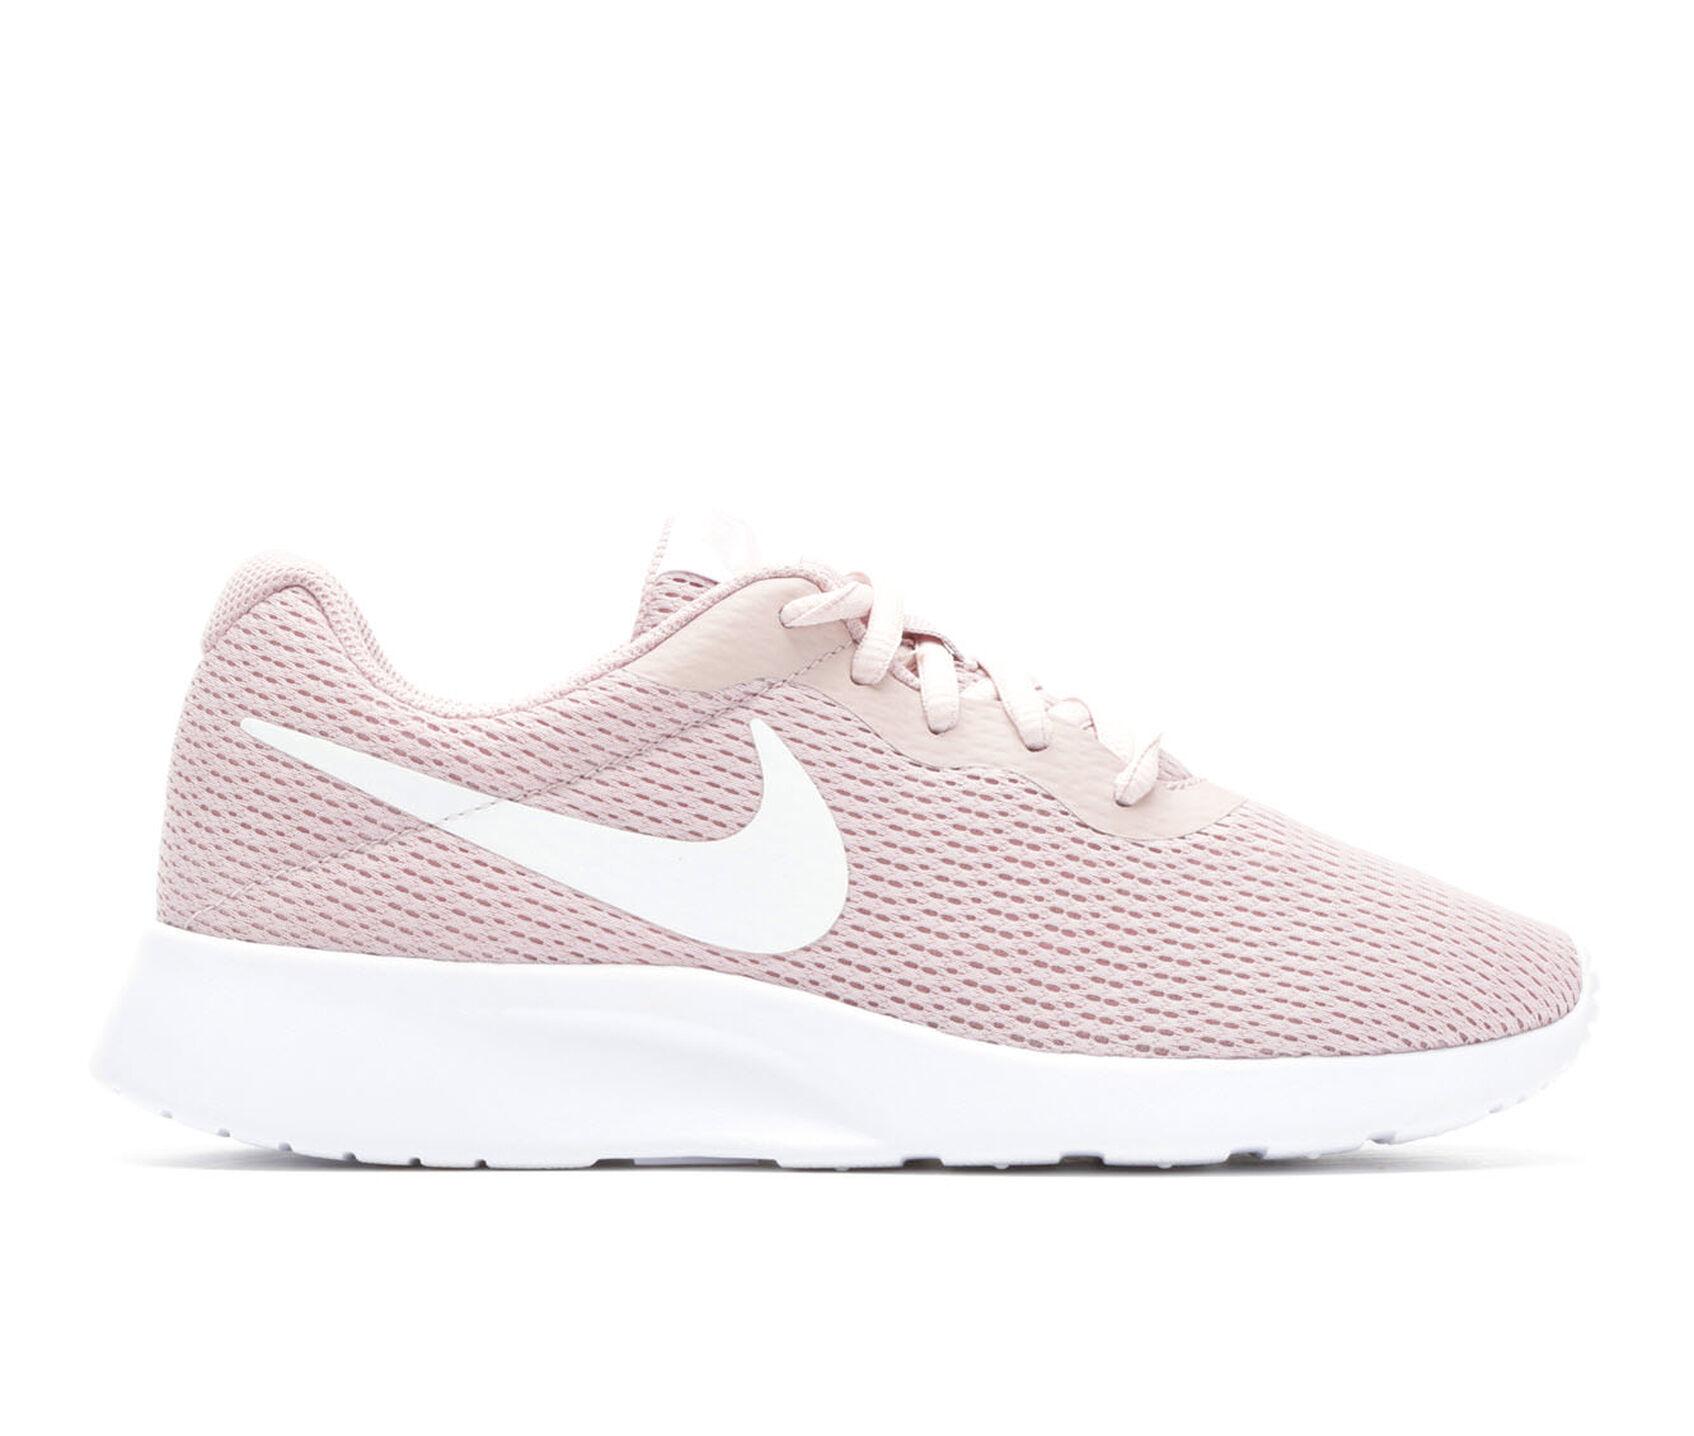 030df8f434df Jordan Melo M8 Size 13 Nike Braata White 90 Inch